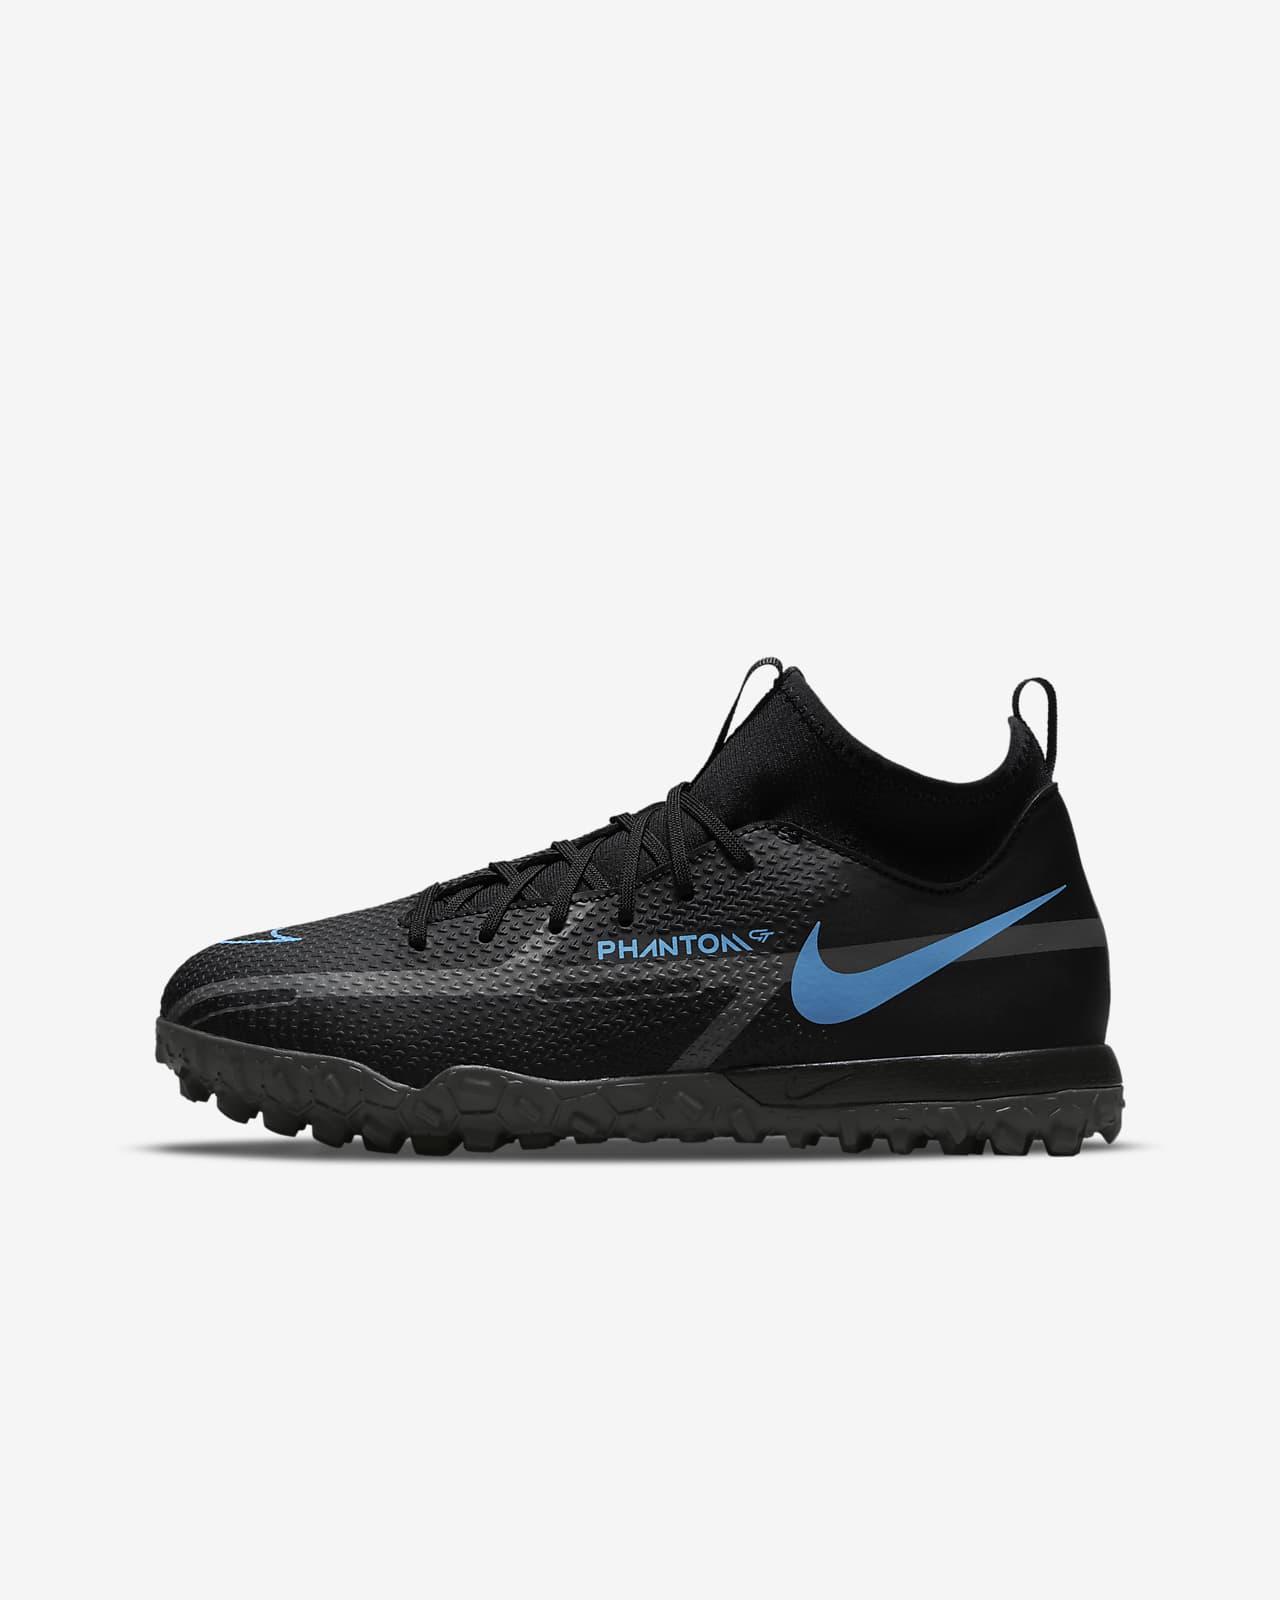 Nike Jr. Phantom GT2 Academy Dynamic Fit TF Younger/Older Kids' Turf Football Shoe